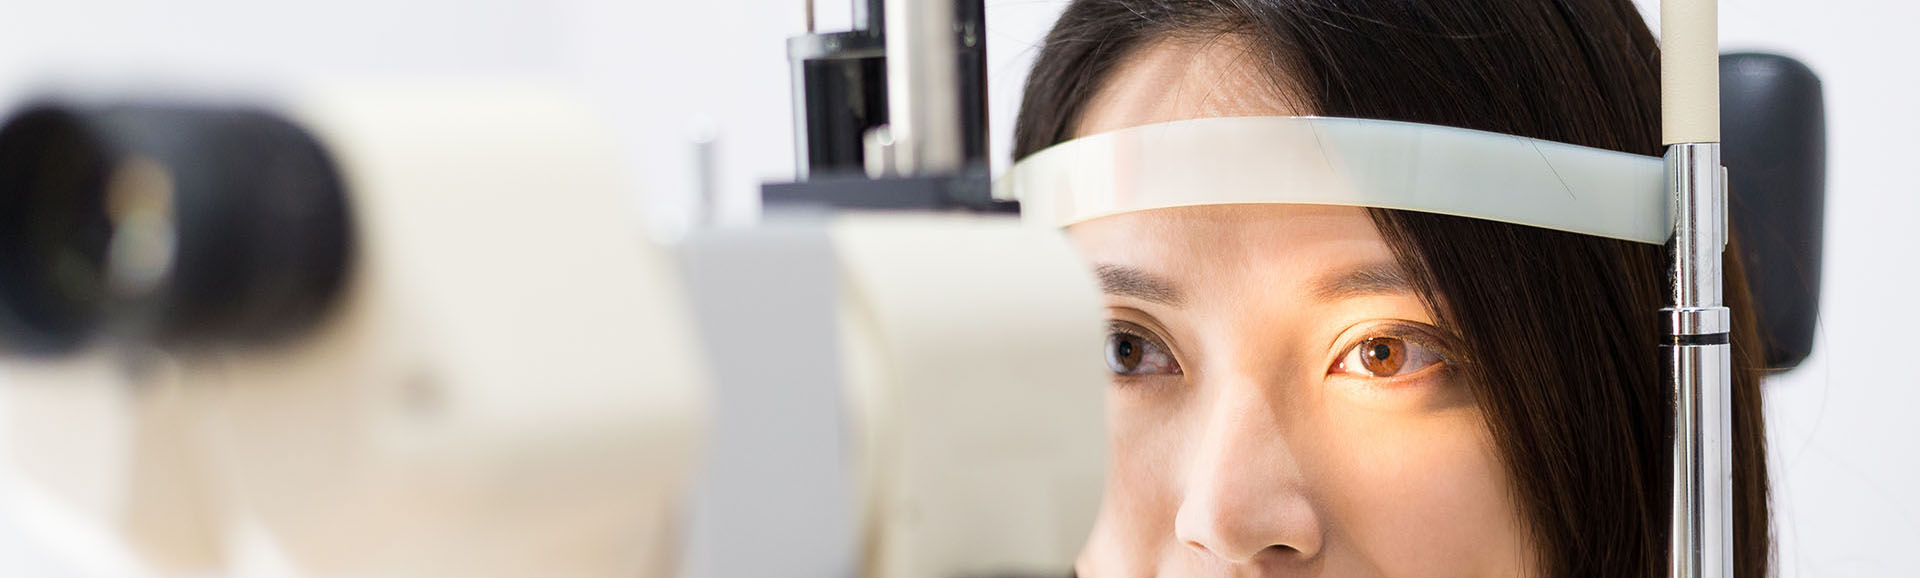 New York Opthalmology Associates - Providing Quality Eye Care